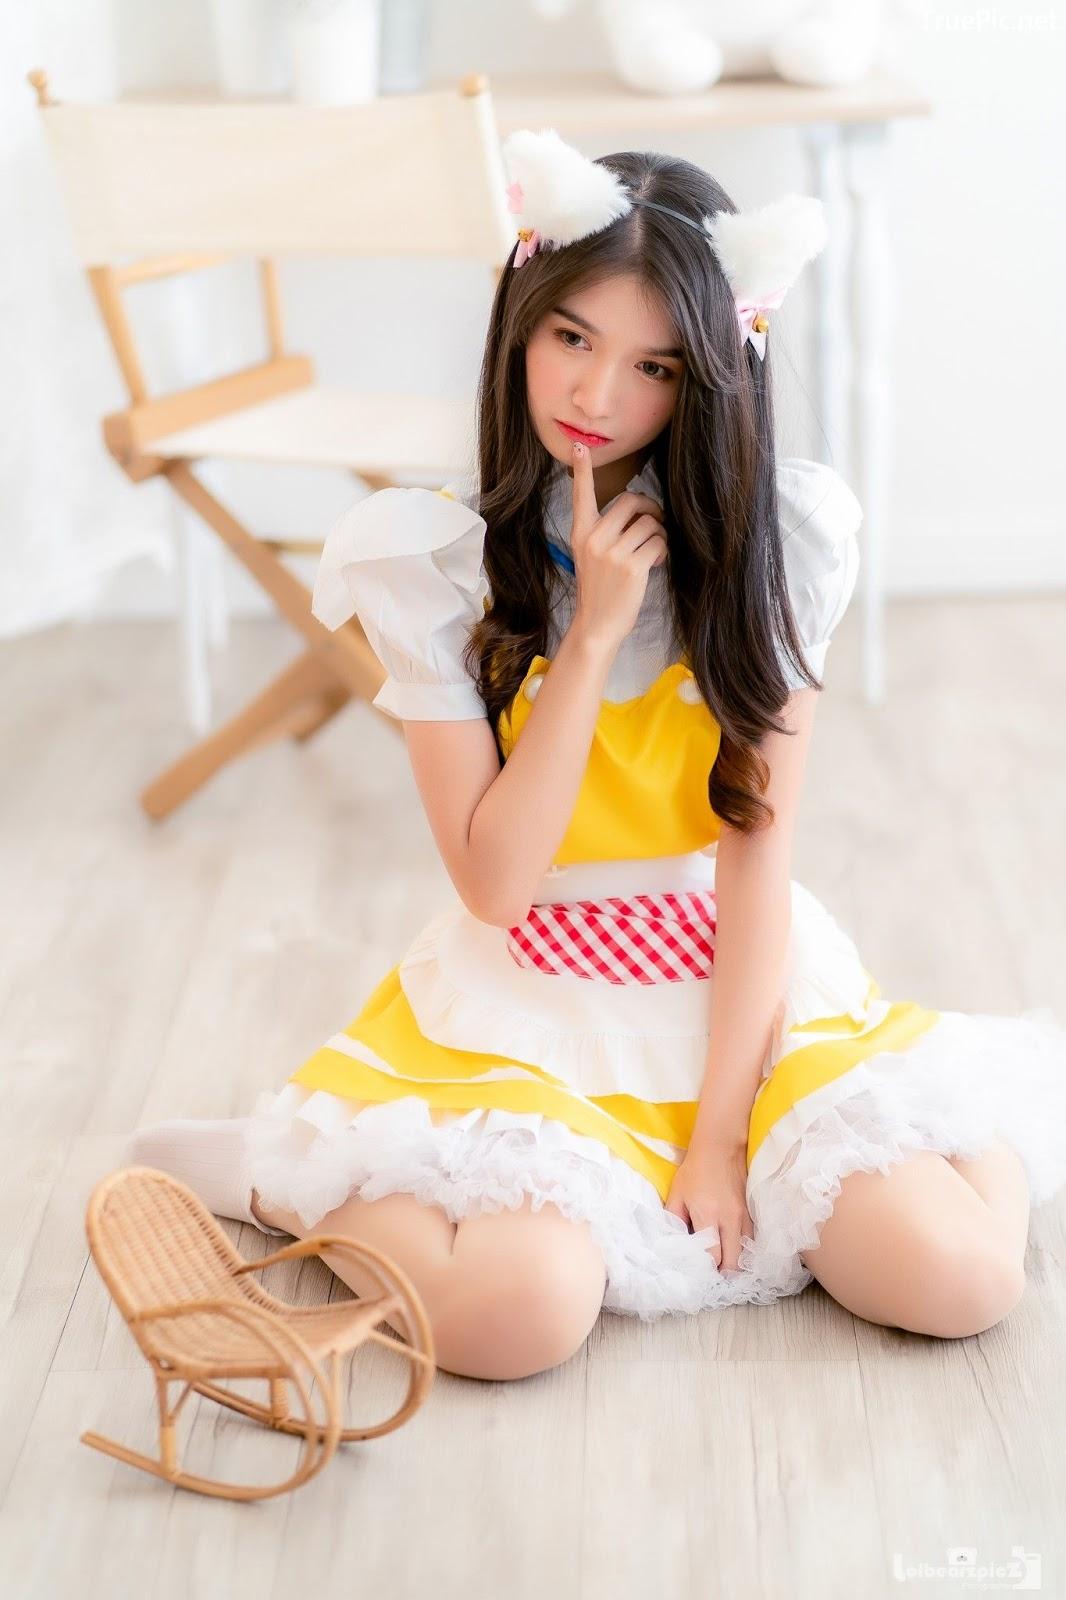 Image Thailand Model - Yatawee Limsiripothong - Cute Maid - TruePic.net - Picture-7